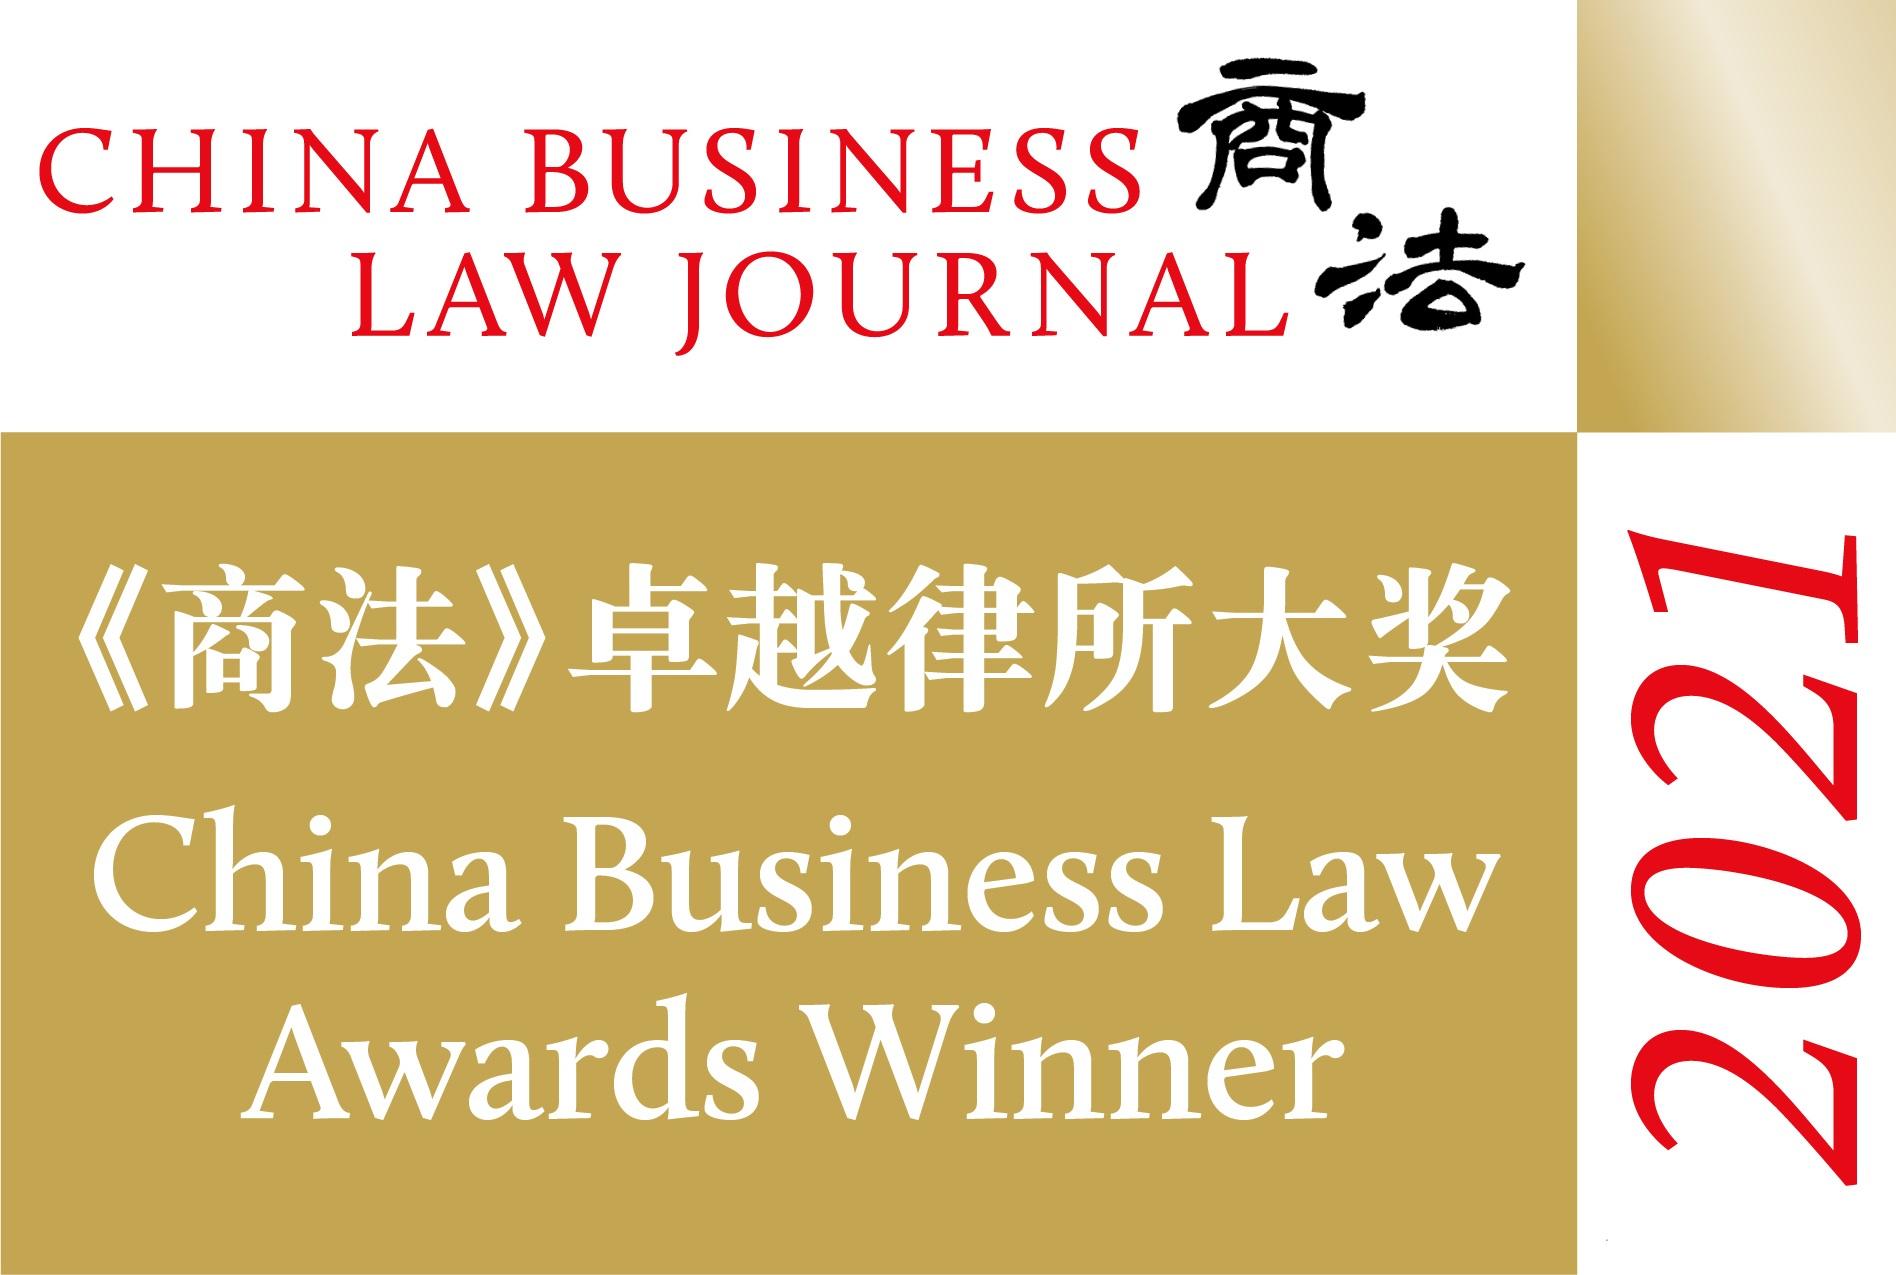 China Business Law Awards 2021 Winner Logo - Awards